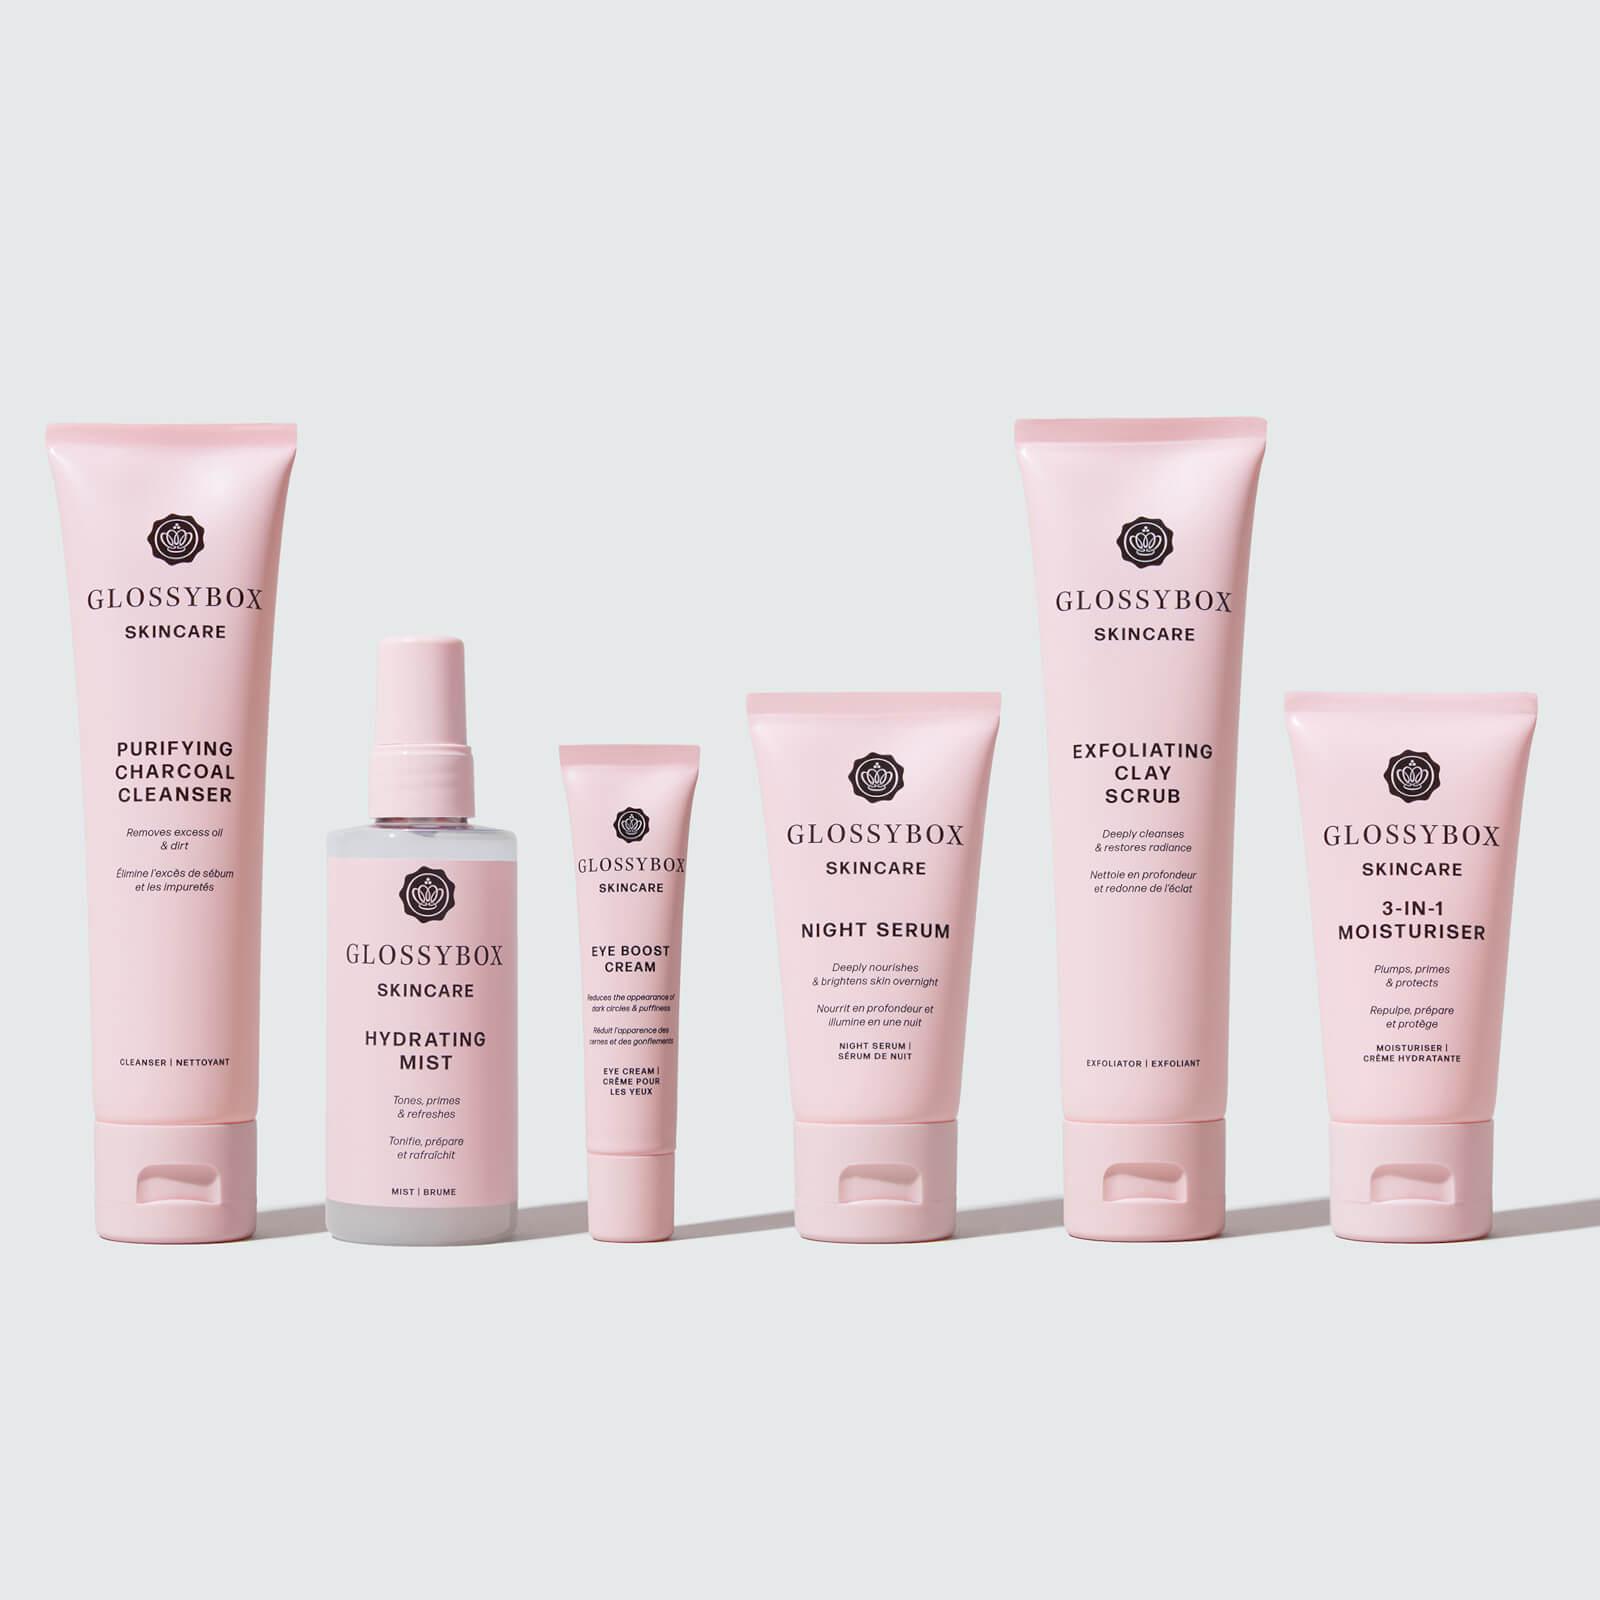 Glossy Box coupon: GLOSSYBOX Skincare Oily Skin Bundle (Worth $129.00)